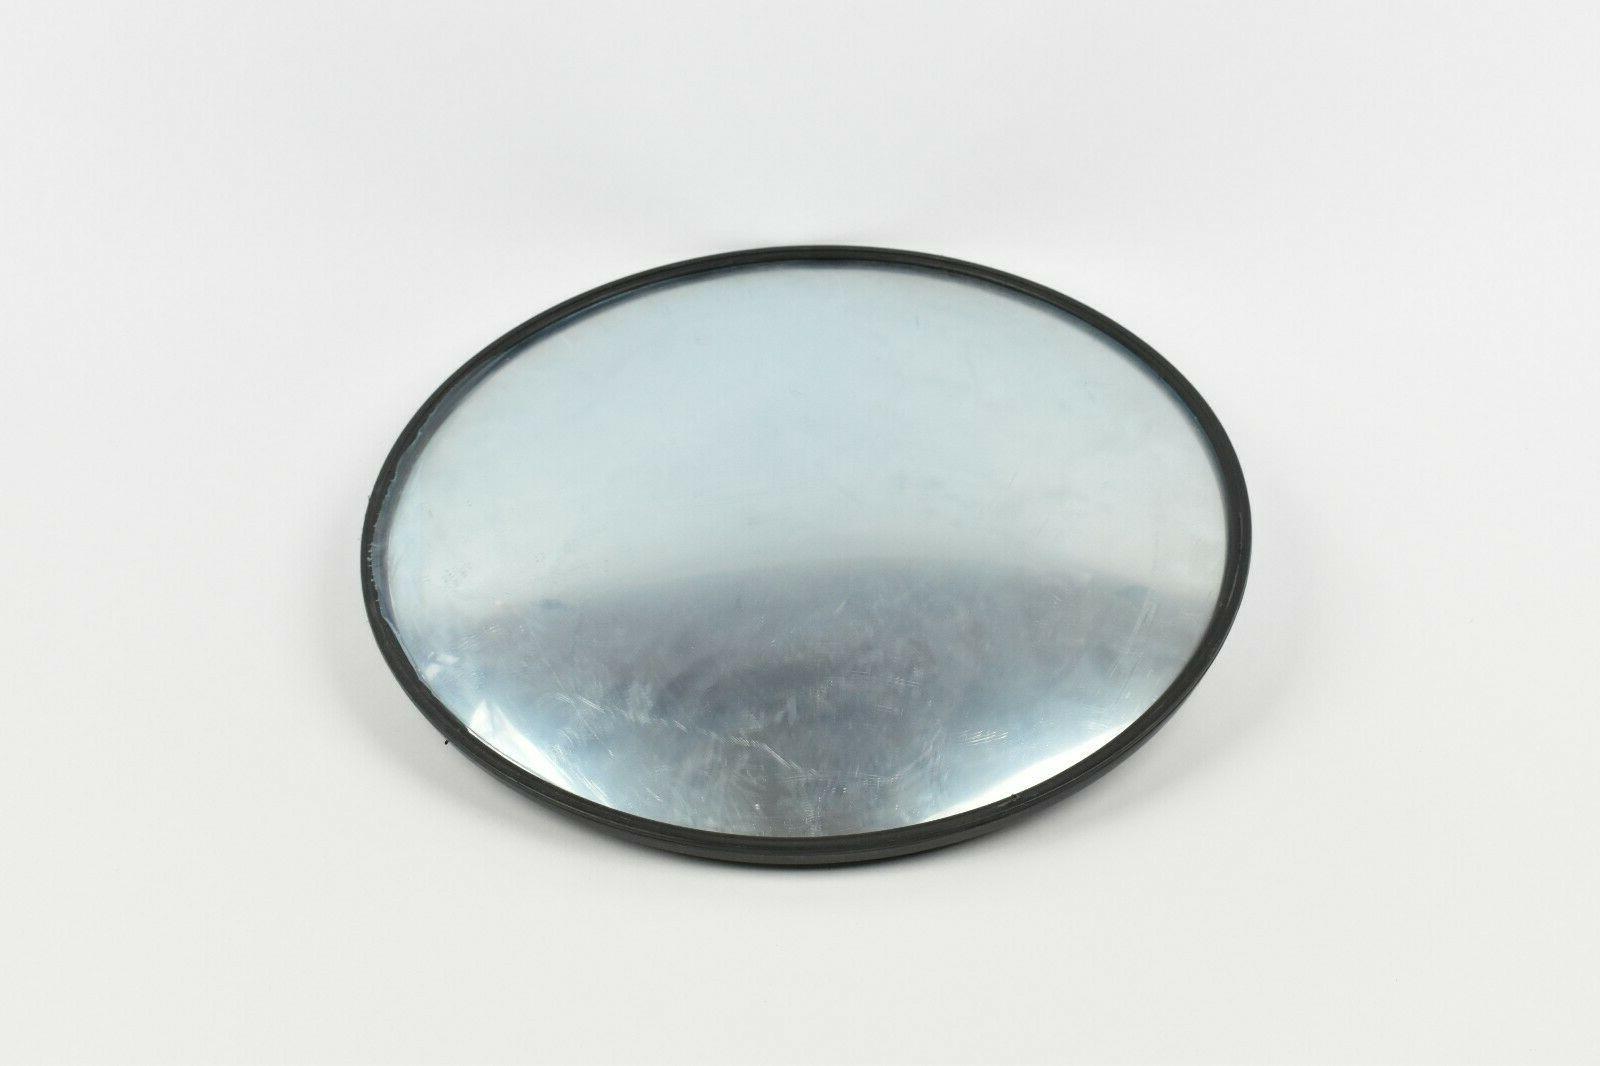 18 inch round glass convex mirror security